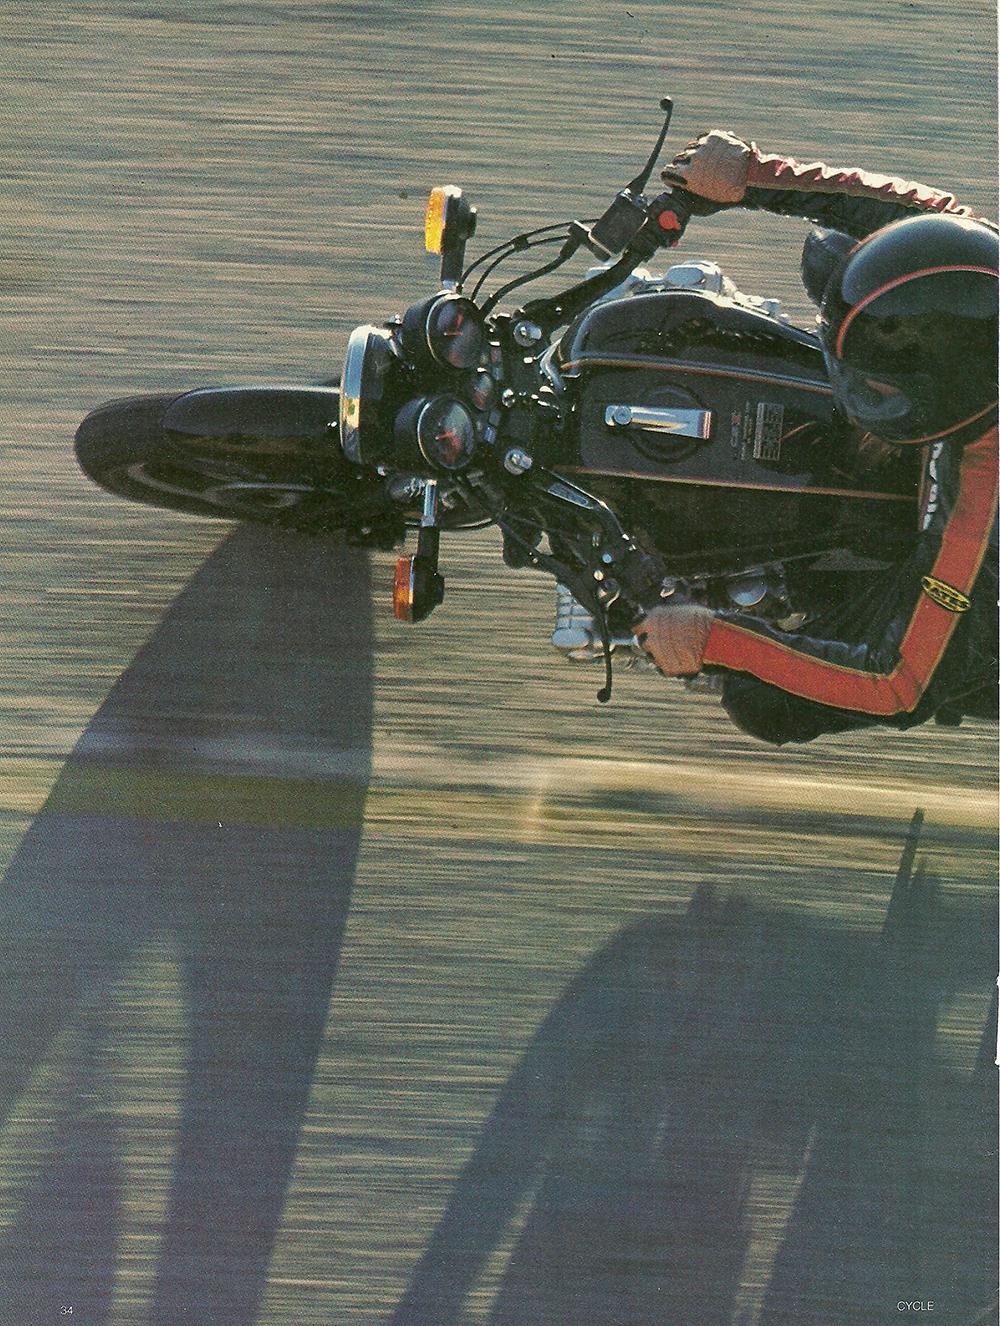 1979 Honda CBX road test 03.jpg